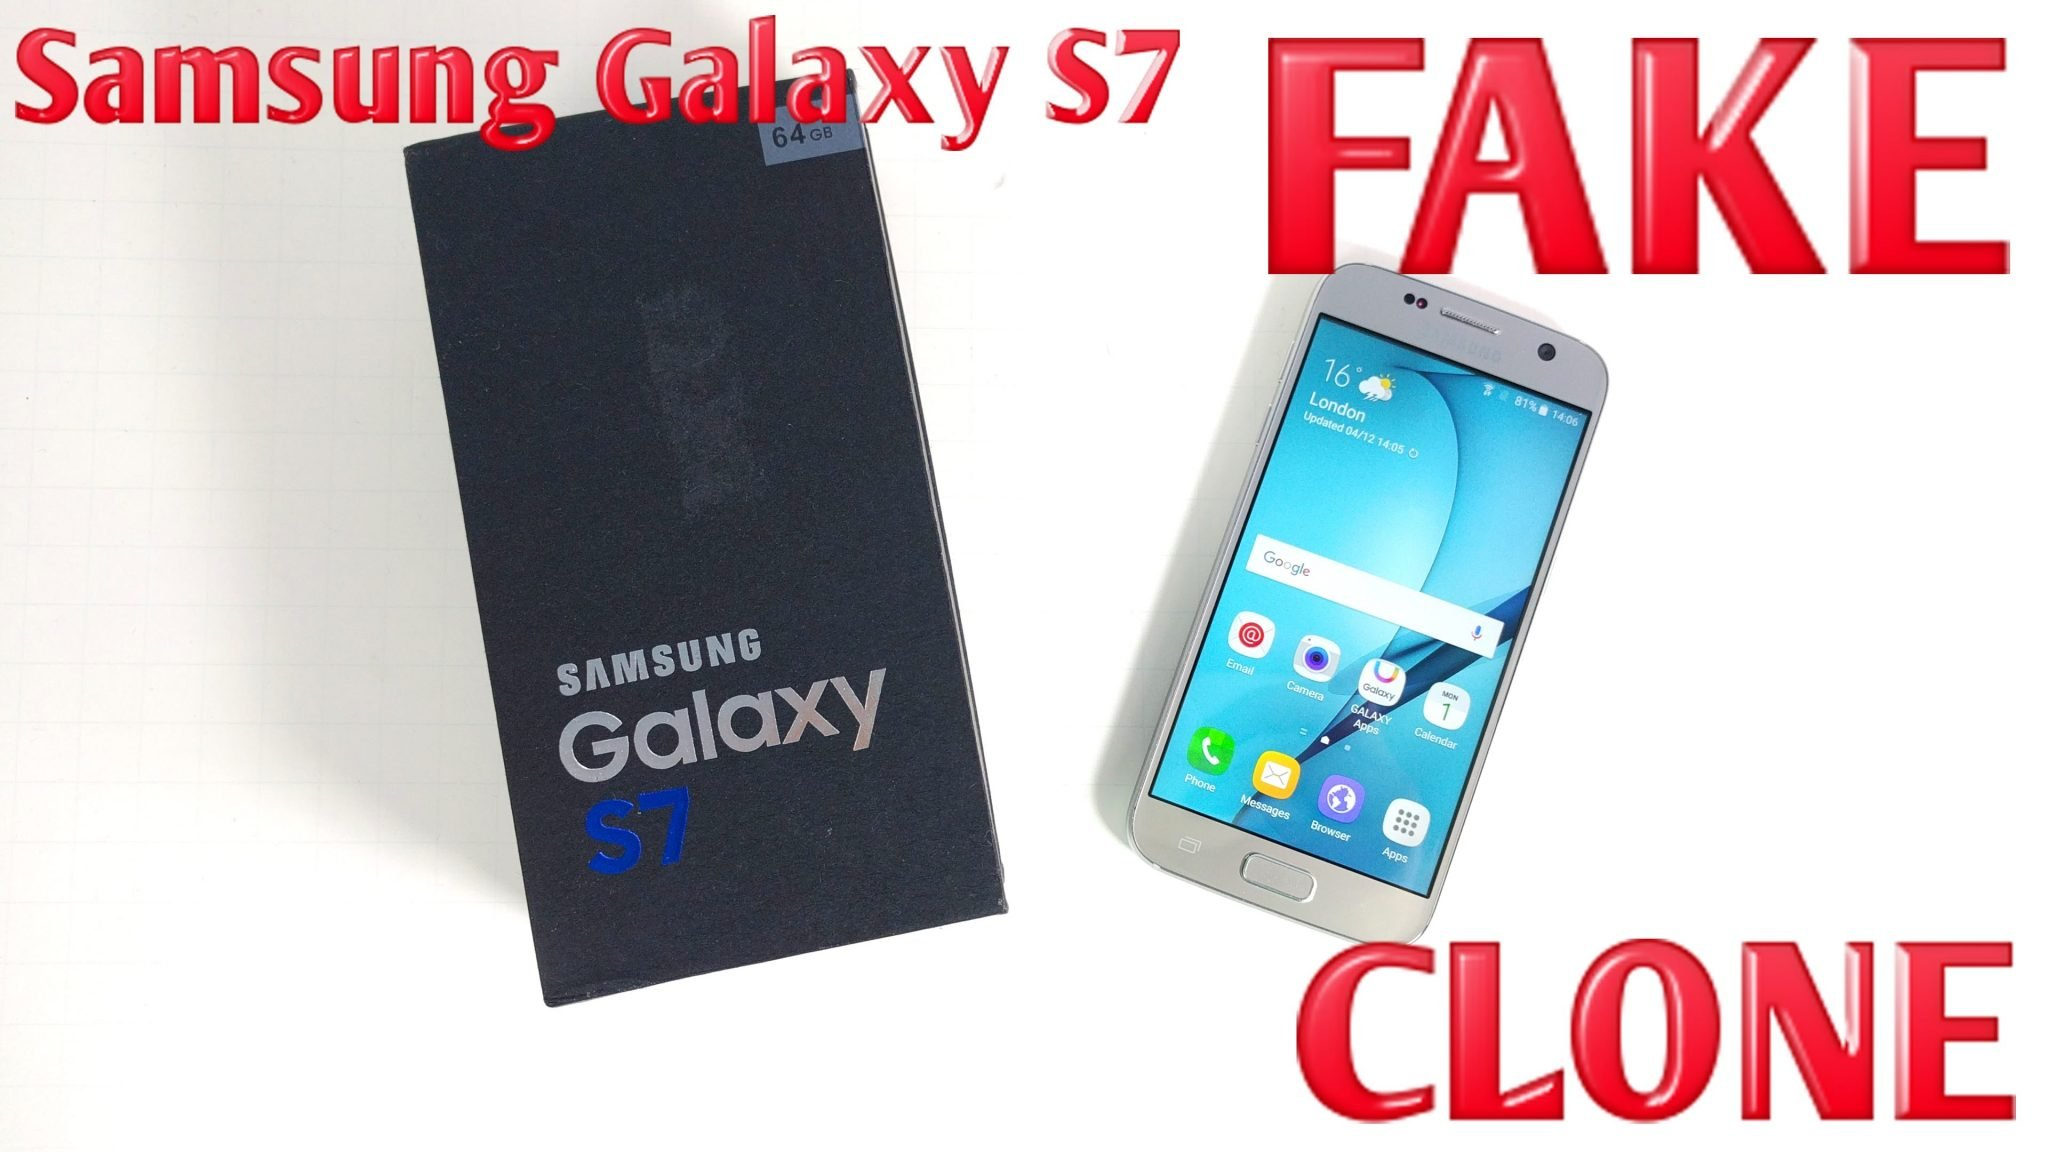 Photo of Fake Samsung Galaxy S7 Price